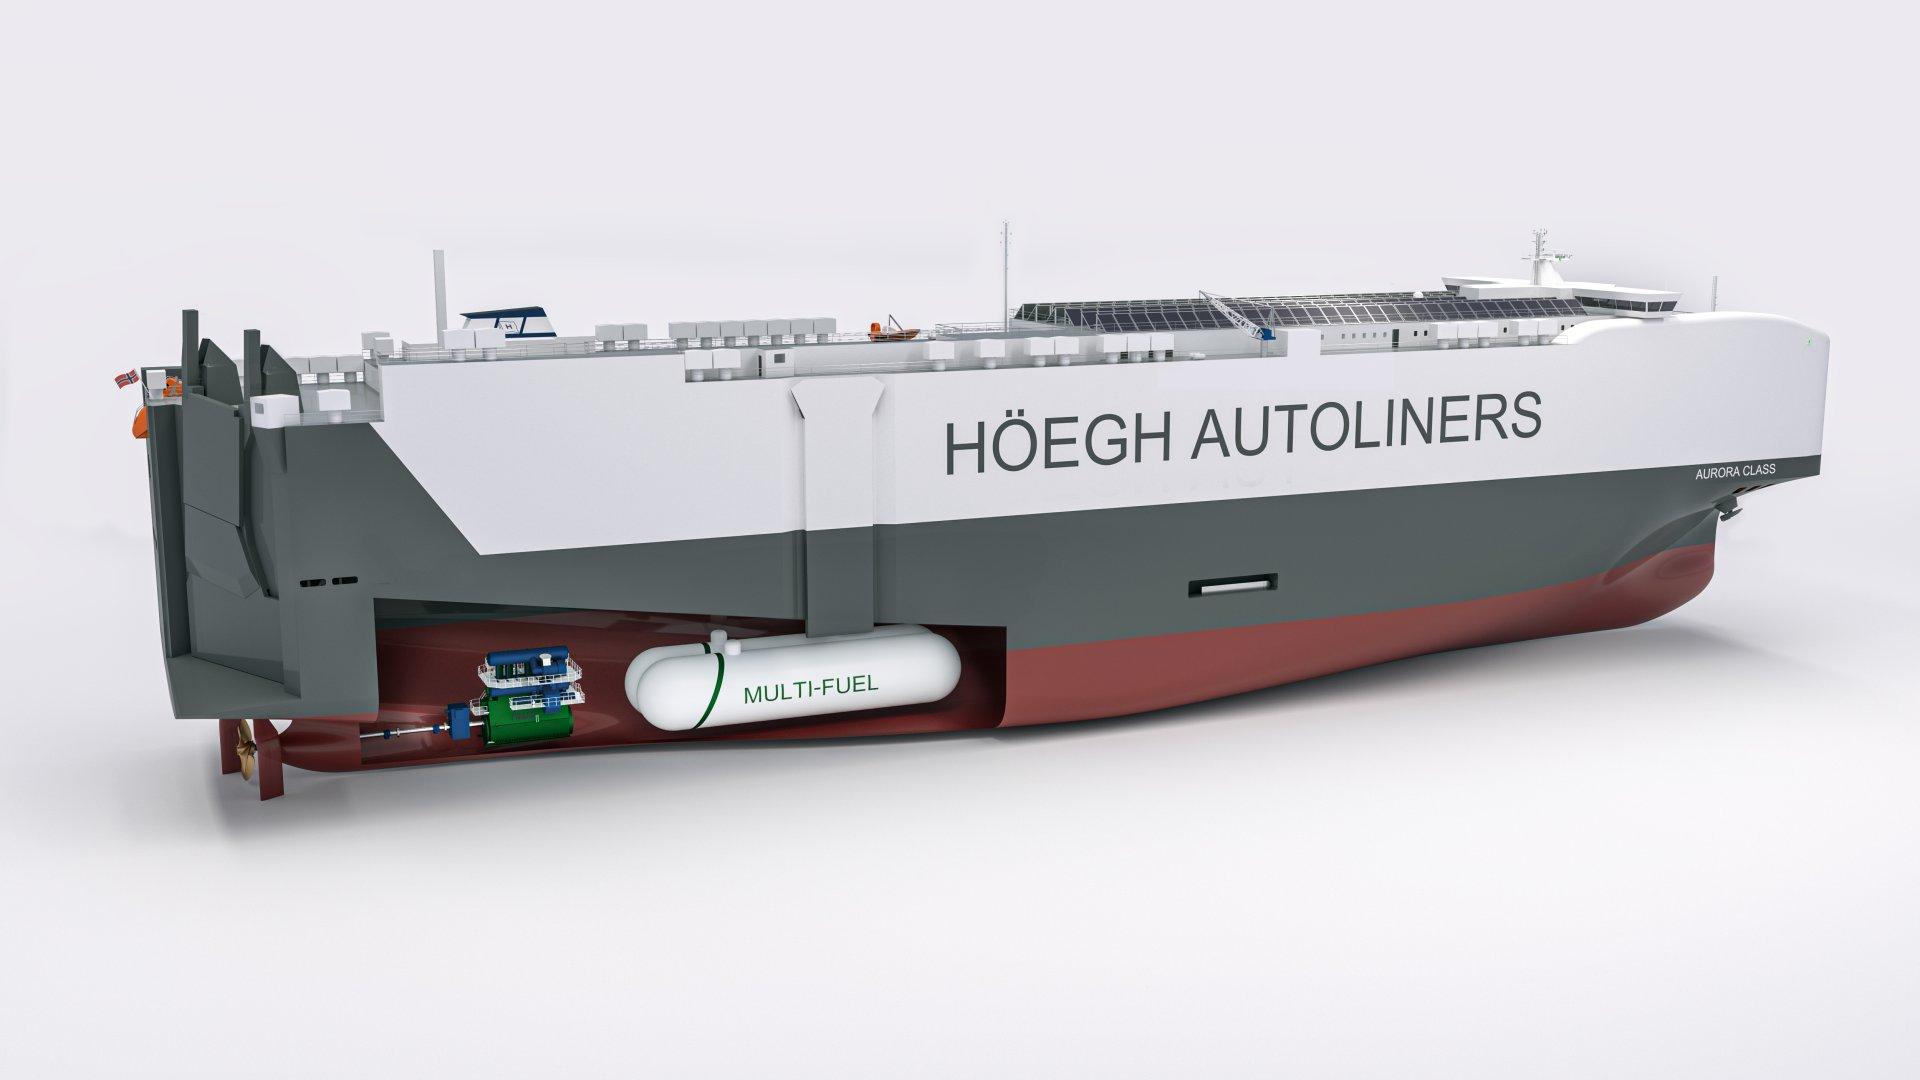 Artist's impression van de Höegh carcarrier met 'multi fuel'-motoren. (Illustratie Höegh Autoliners)